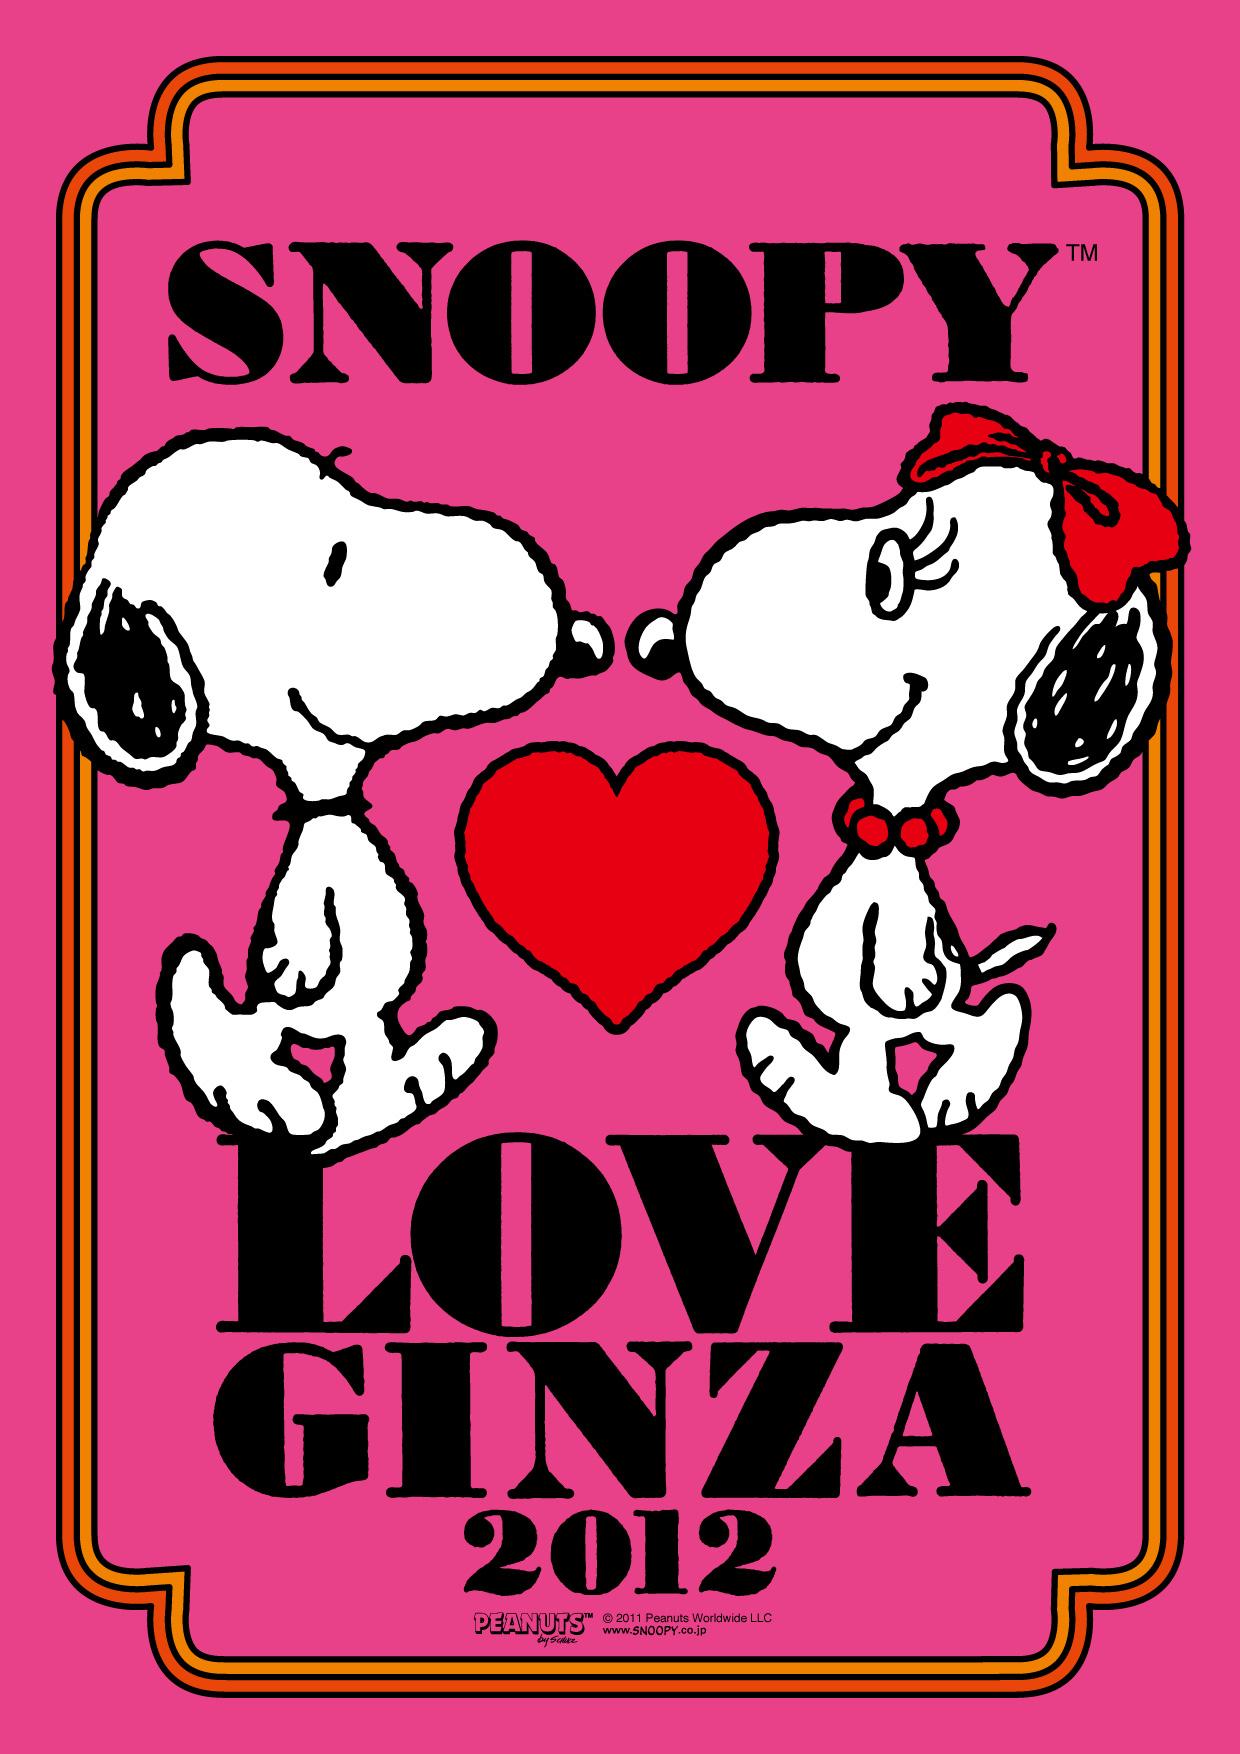 Snoopy Love Ginza 2012 豪華限定イベントが続々登場 谷川俊太郎さん